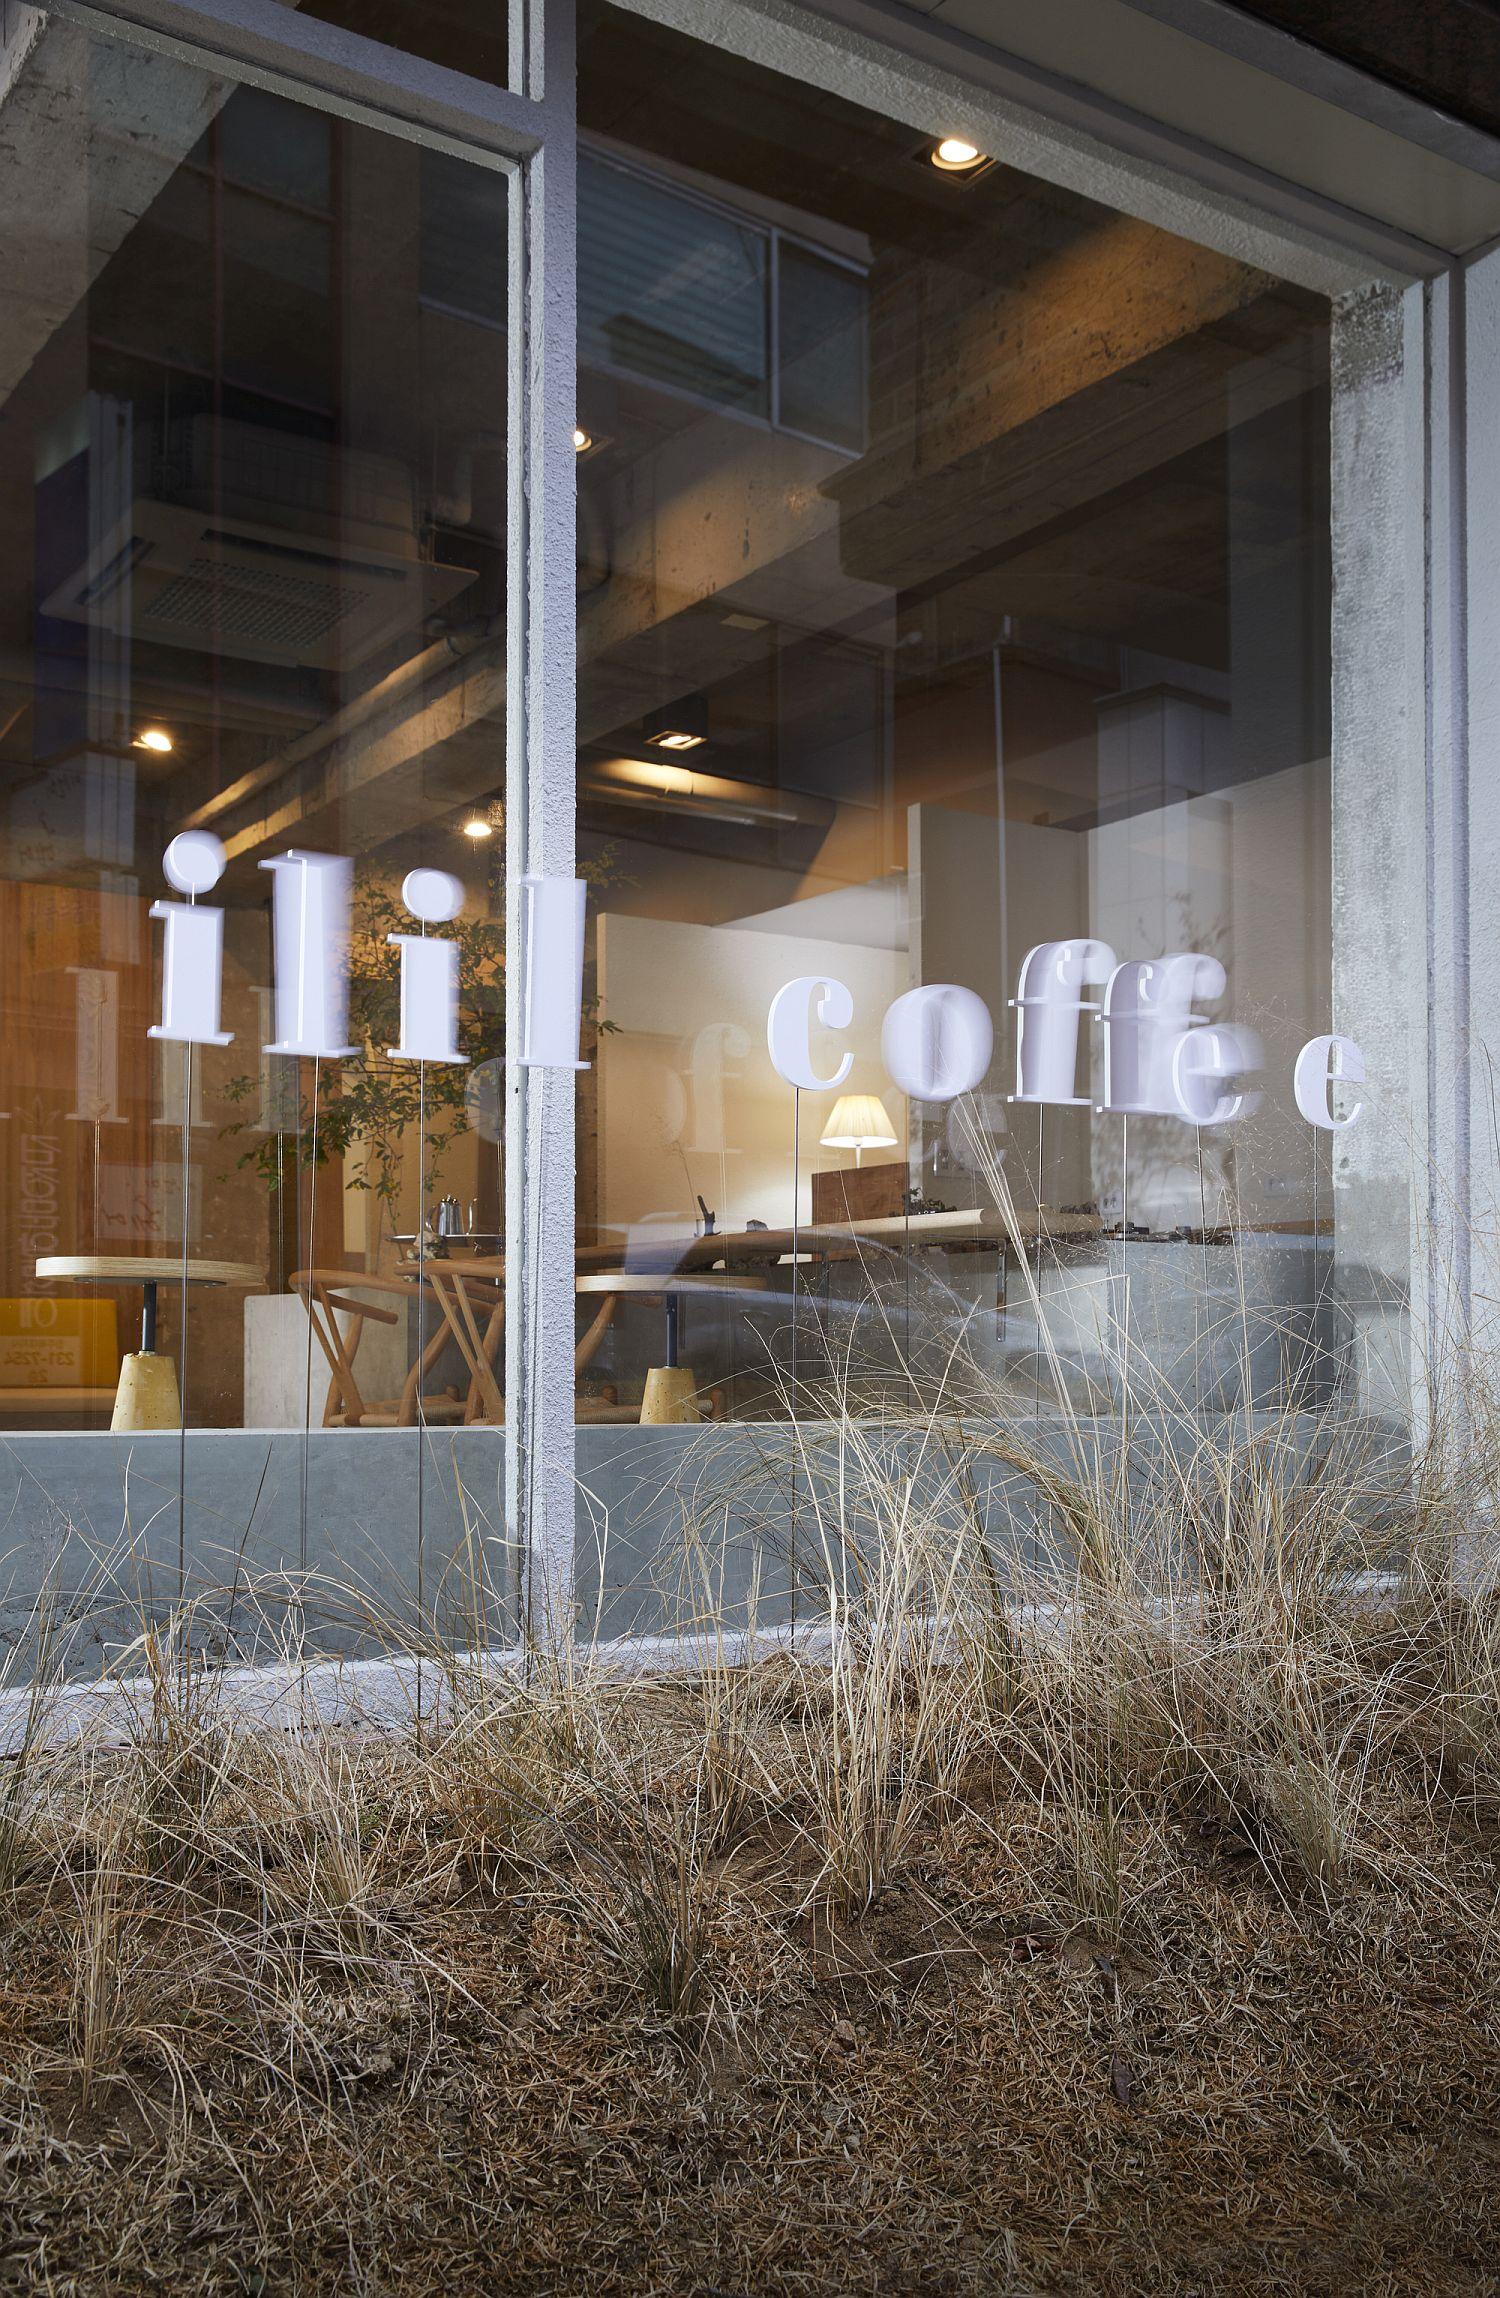 Ilil Coffee House in South Korea